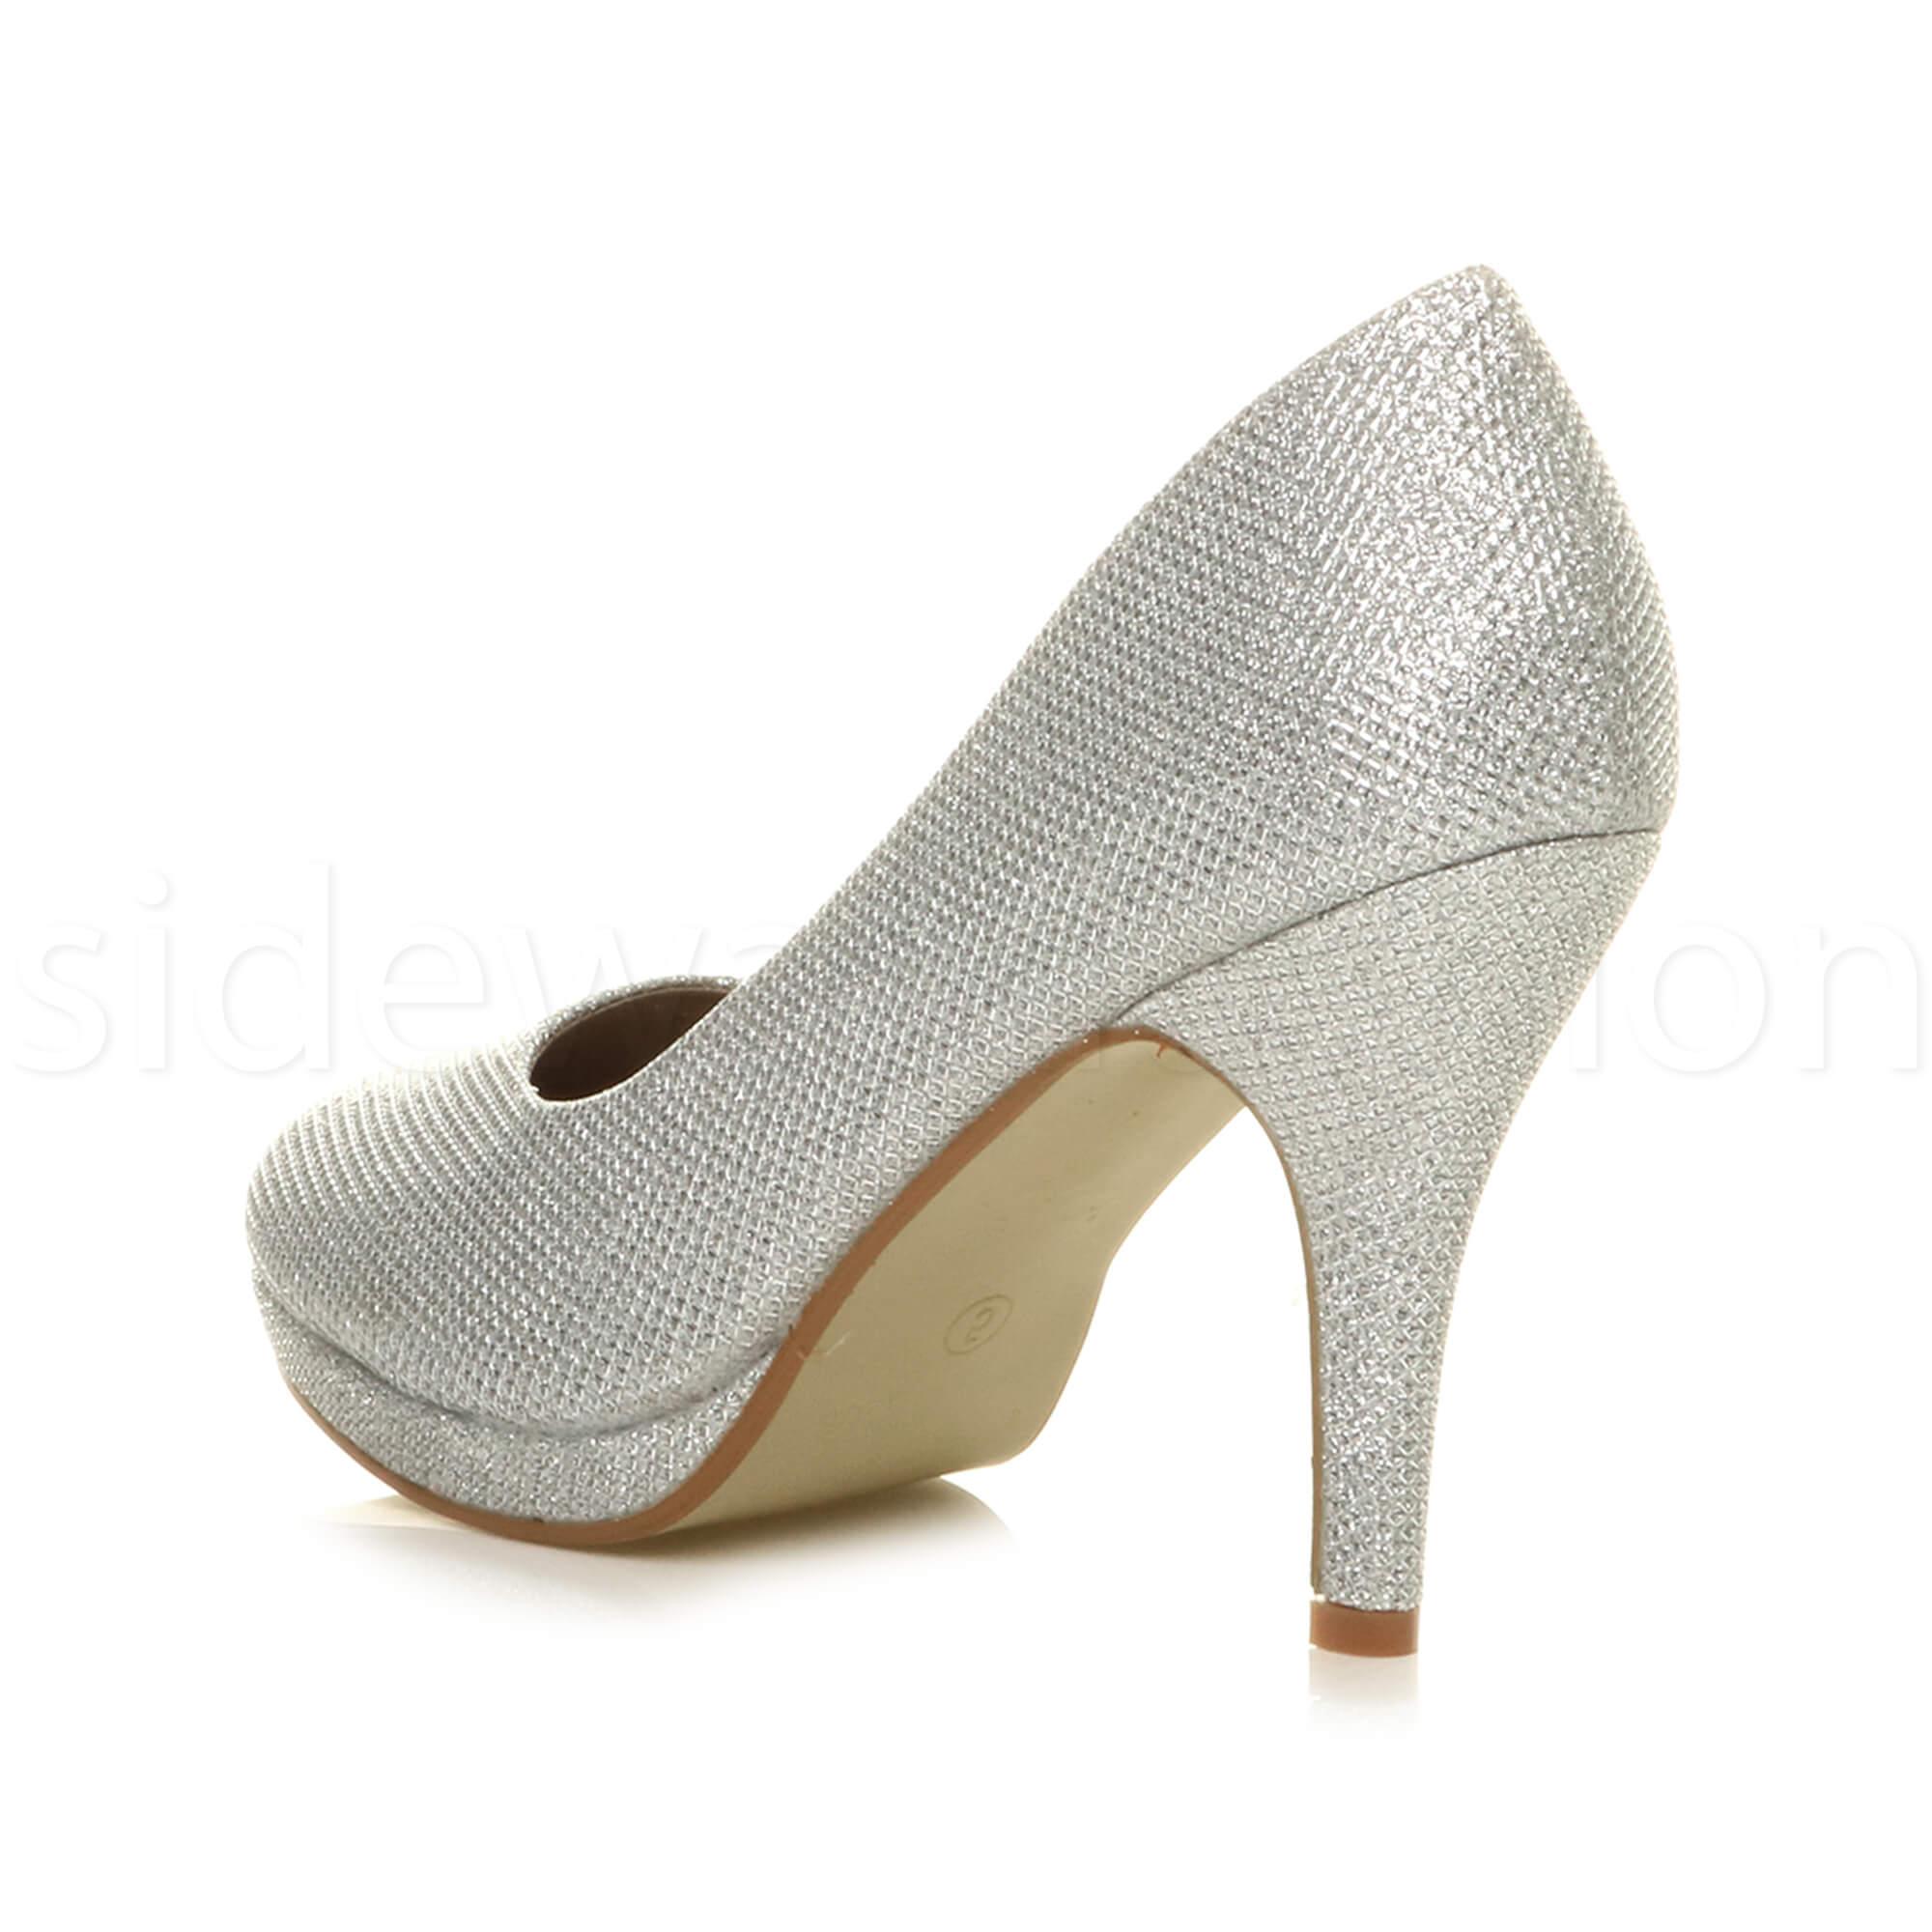 Womens-ladies-high-mid-heel-platform-wedding-evening-bridesmaid-court-shoes-size thumbnail 173